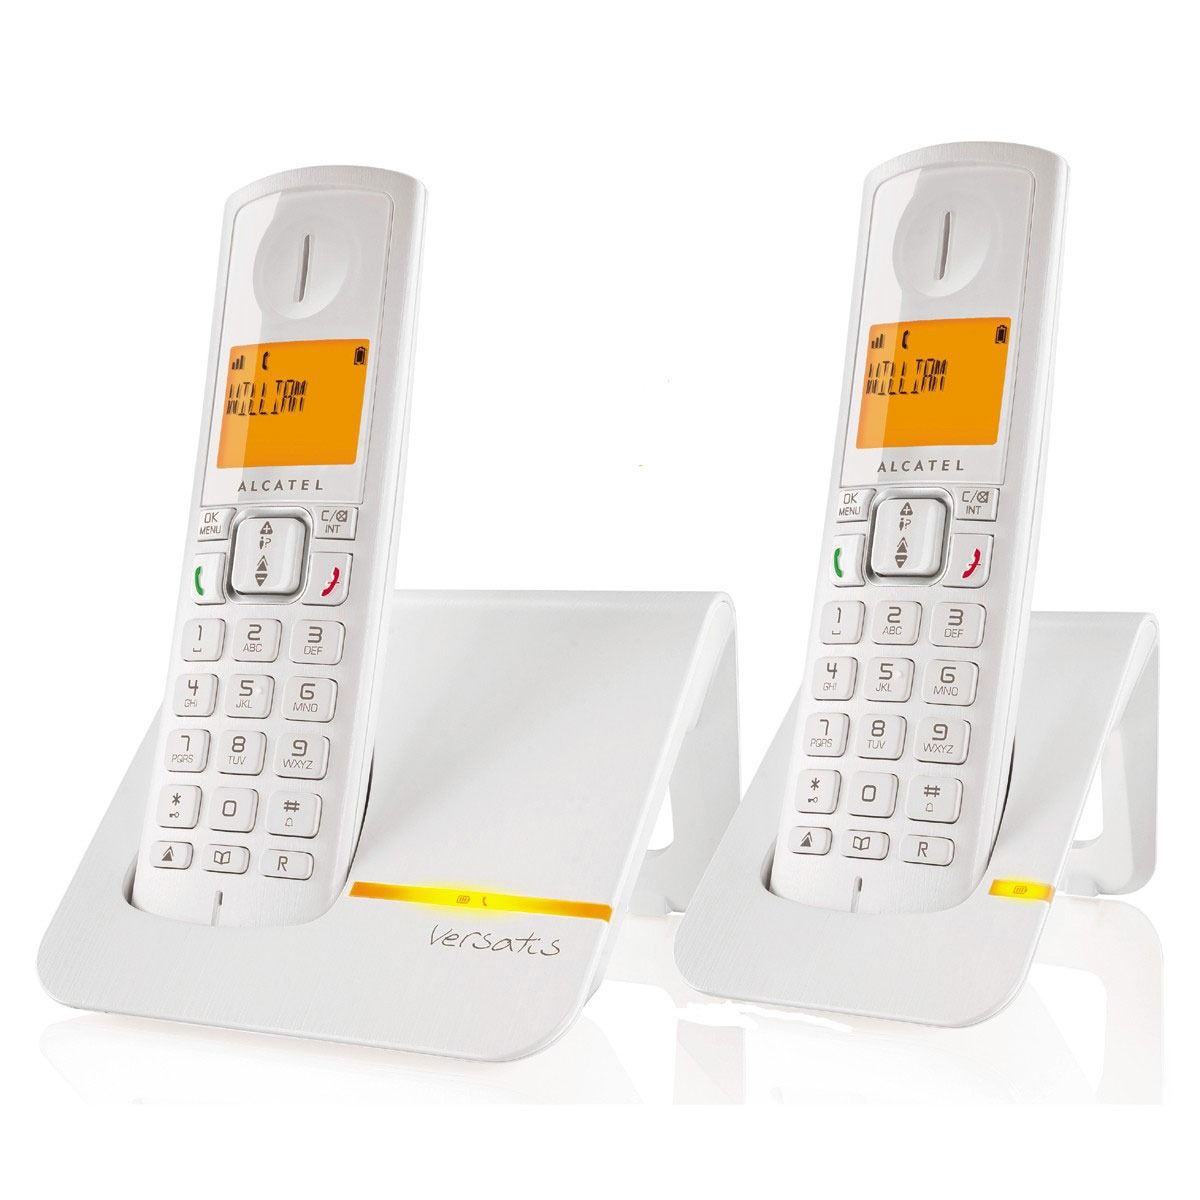 alcatel versatis f200 duo blanc t l phone sans fil alcatel sur. Black Bedroom Furniture Sets. Home Design Ideas